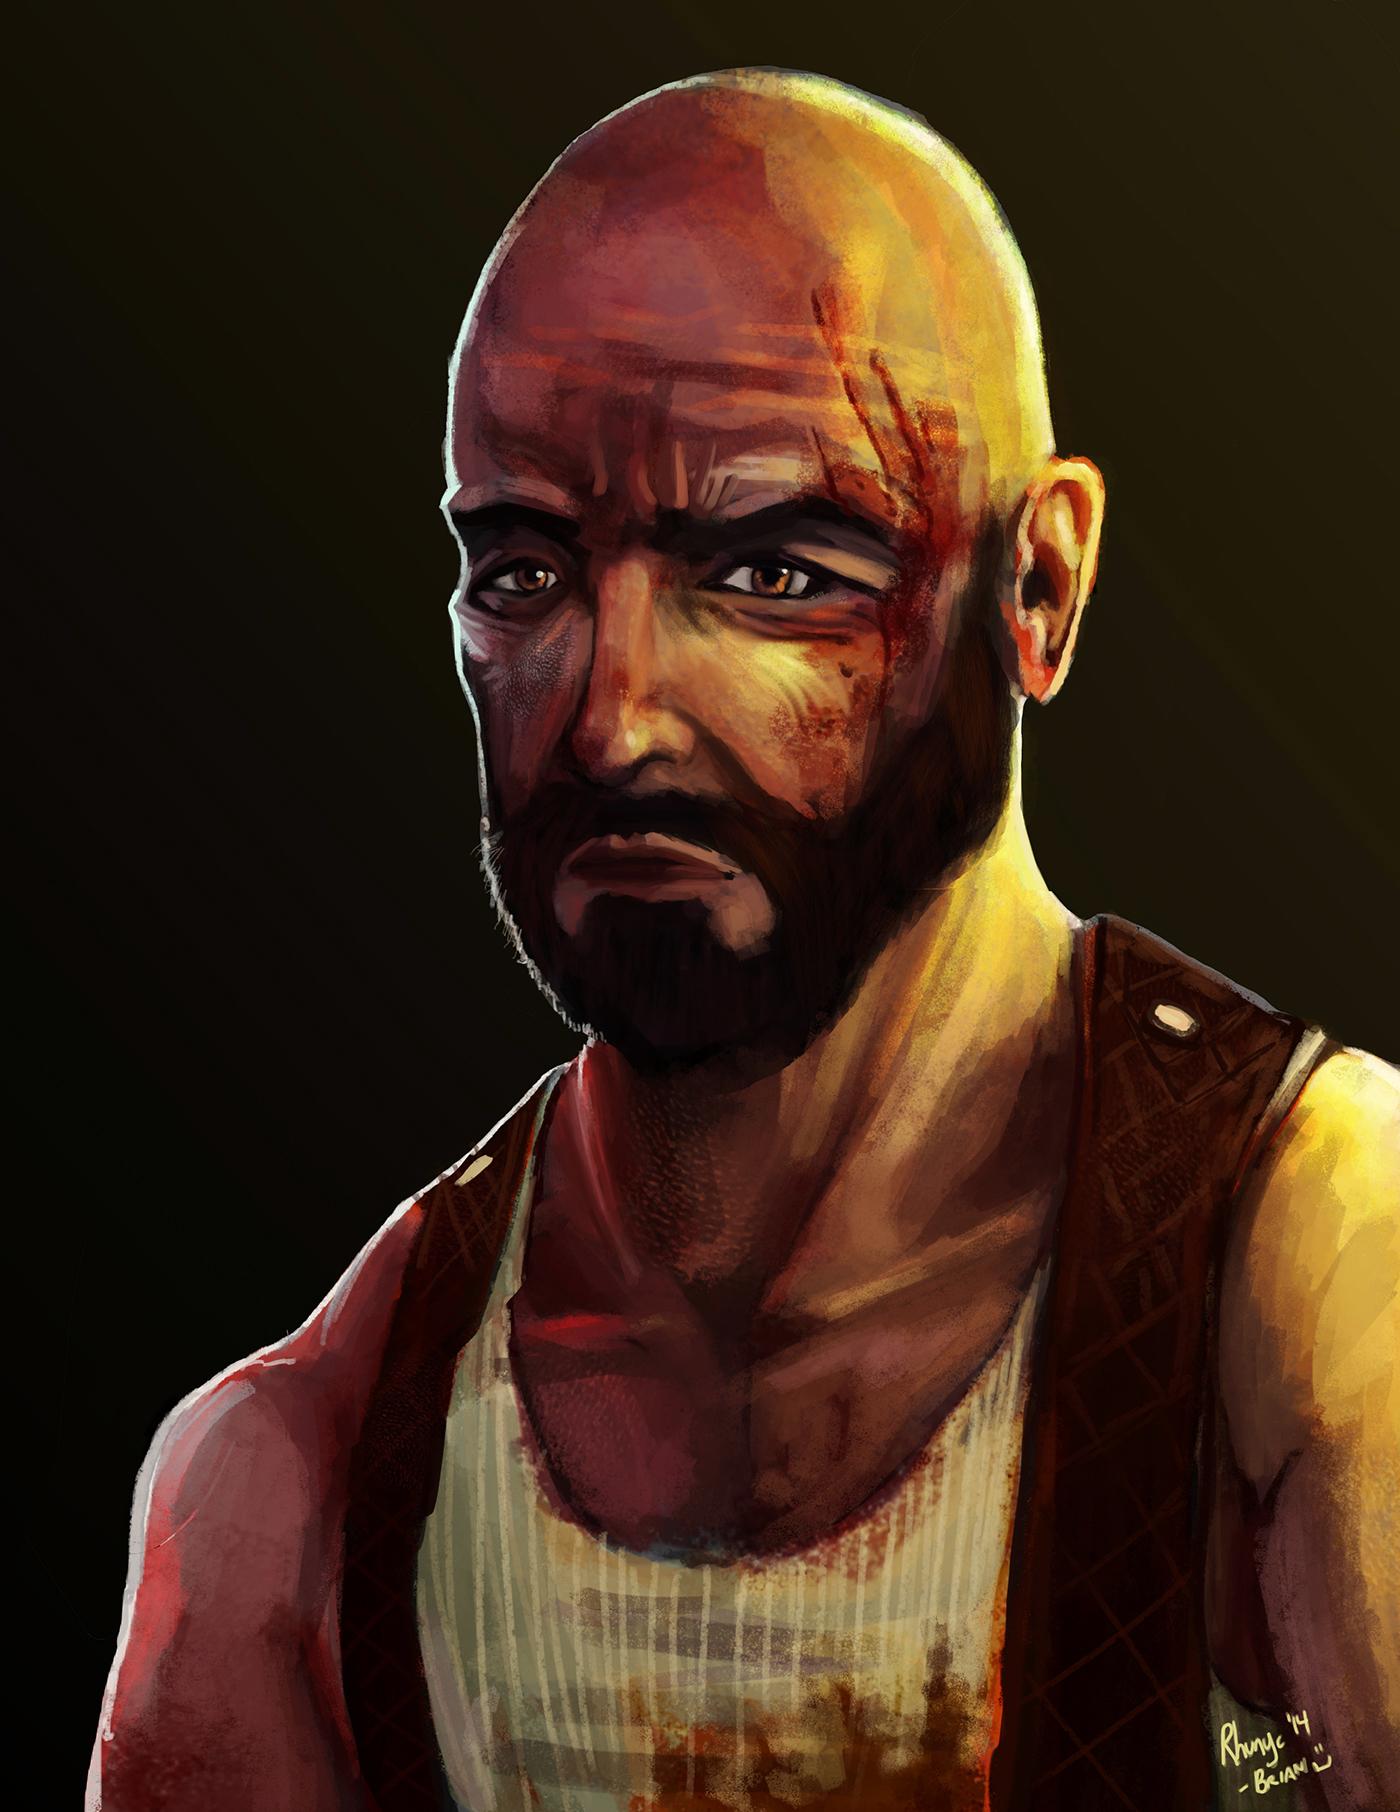 Max Payne - COTMMAN entry